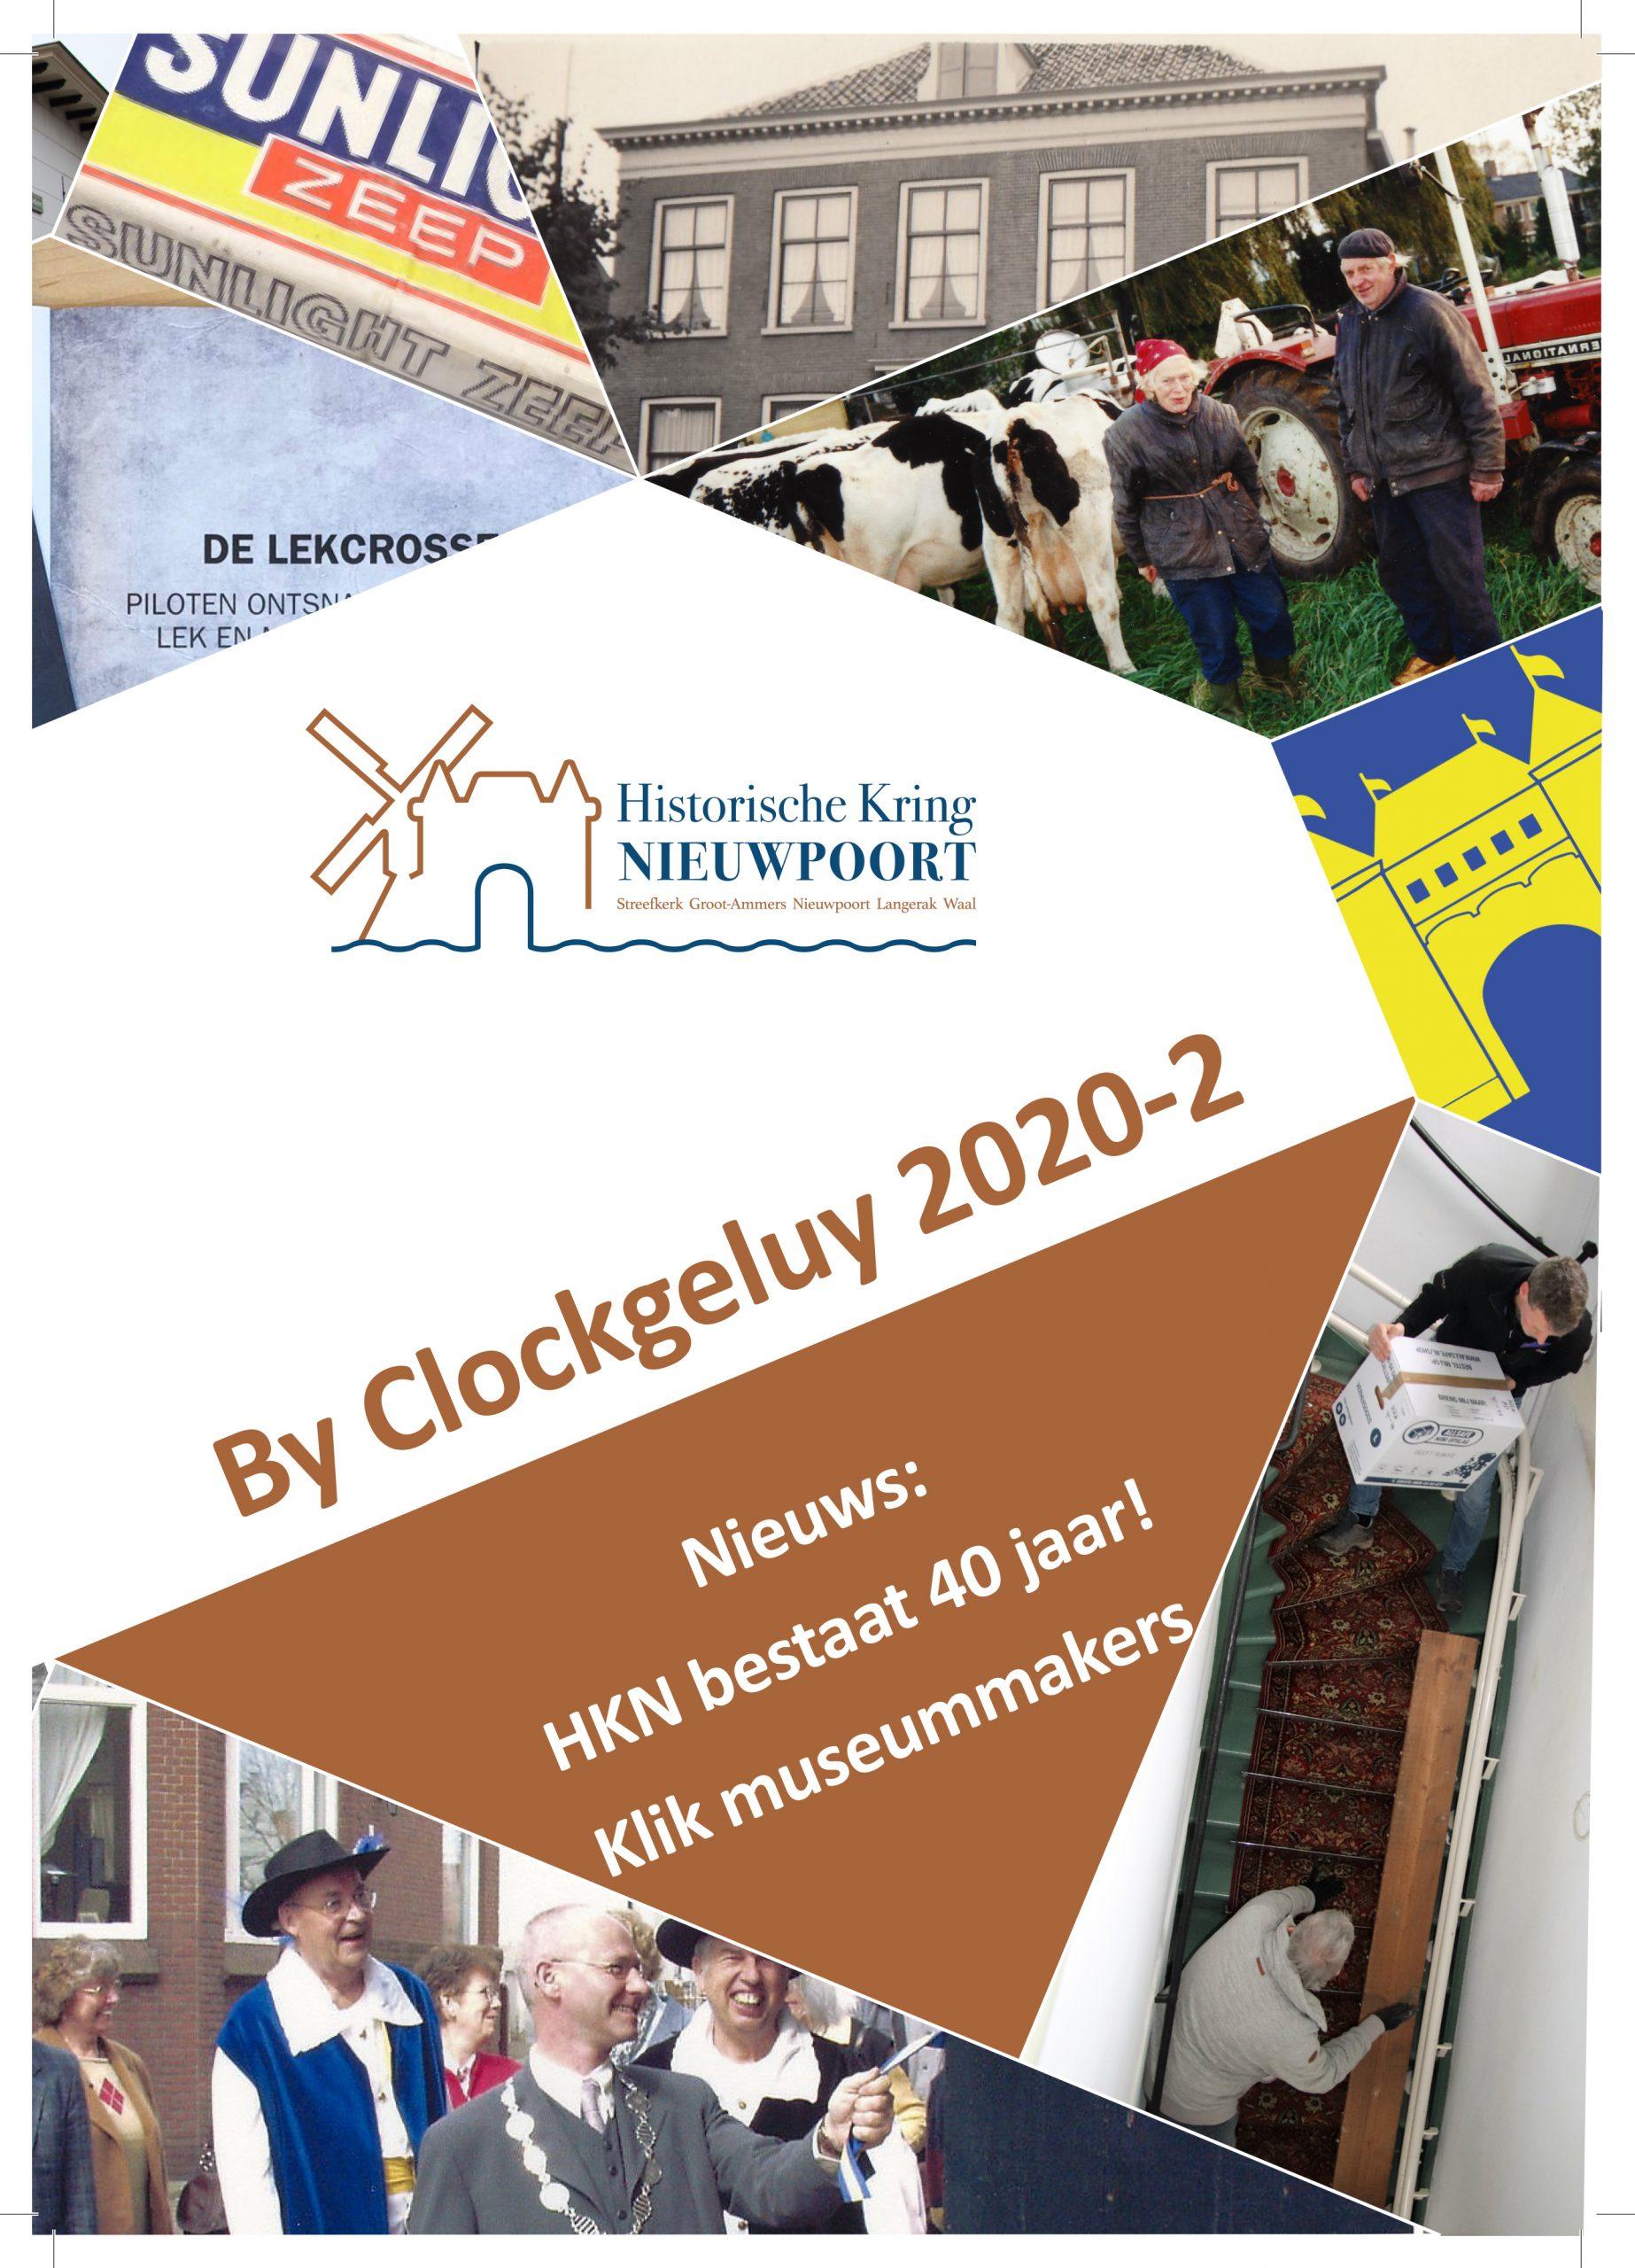 By Clockgeluy 2020-2